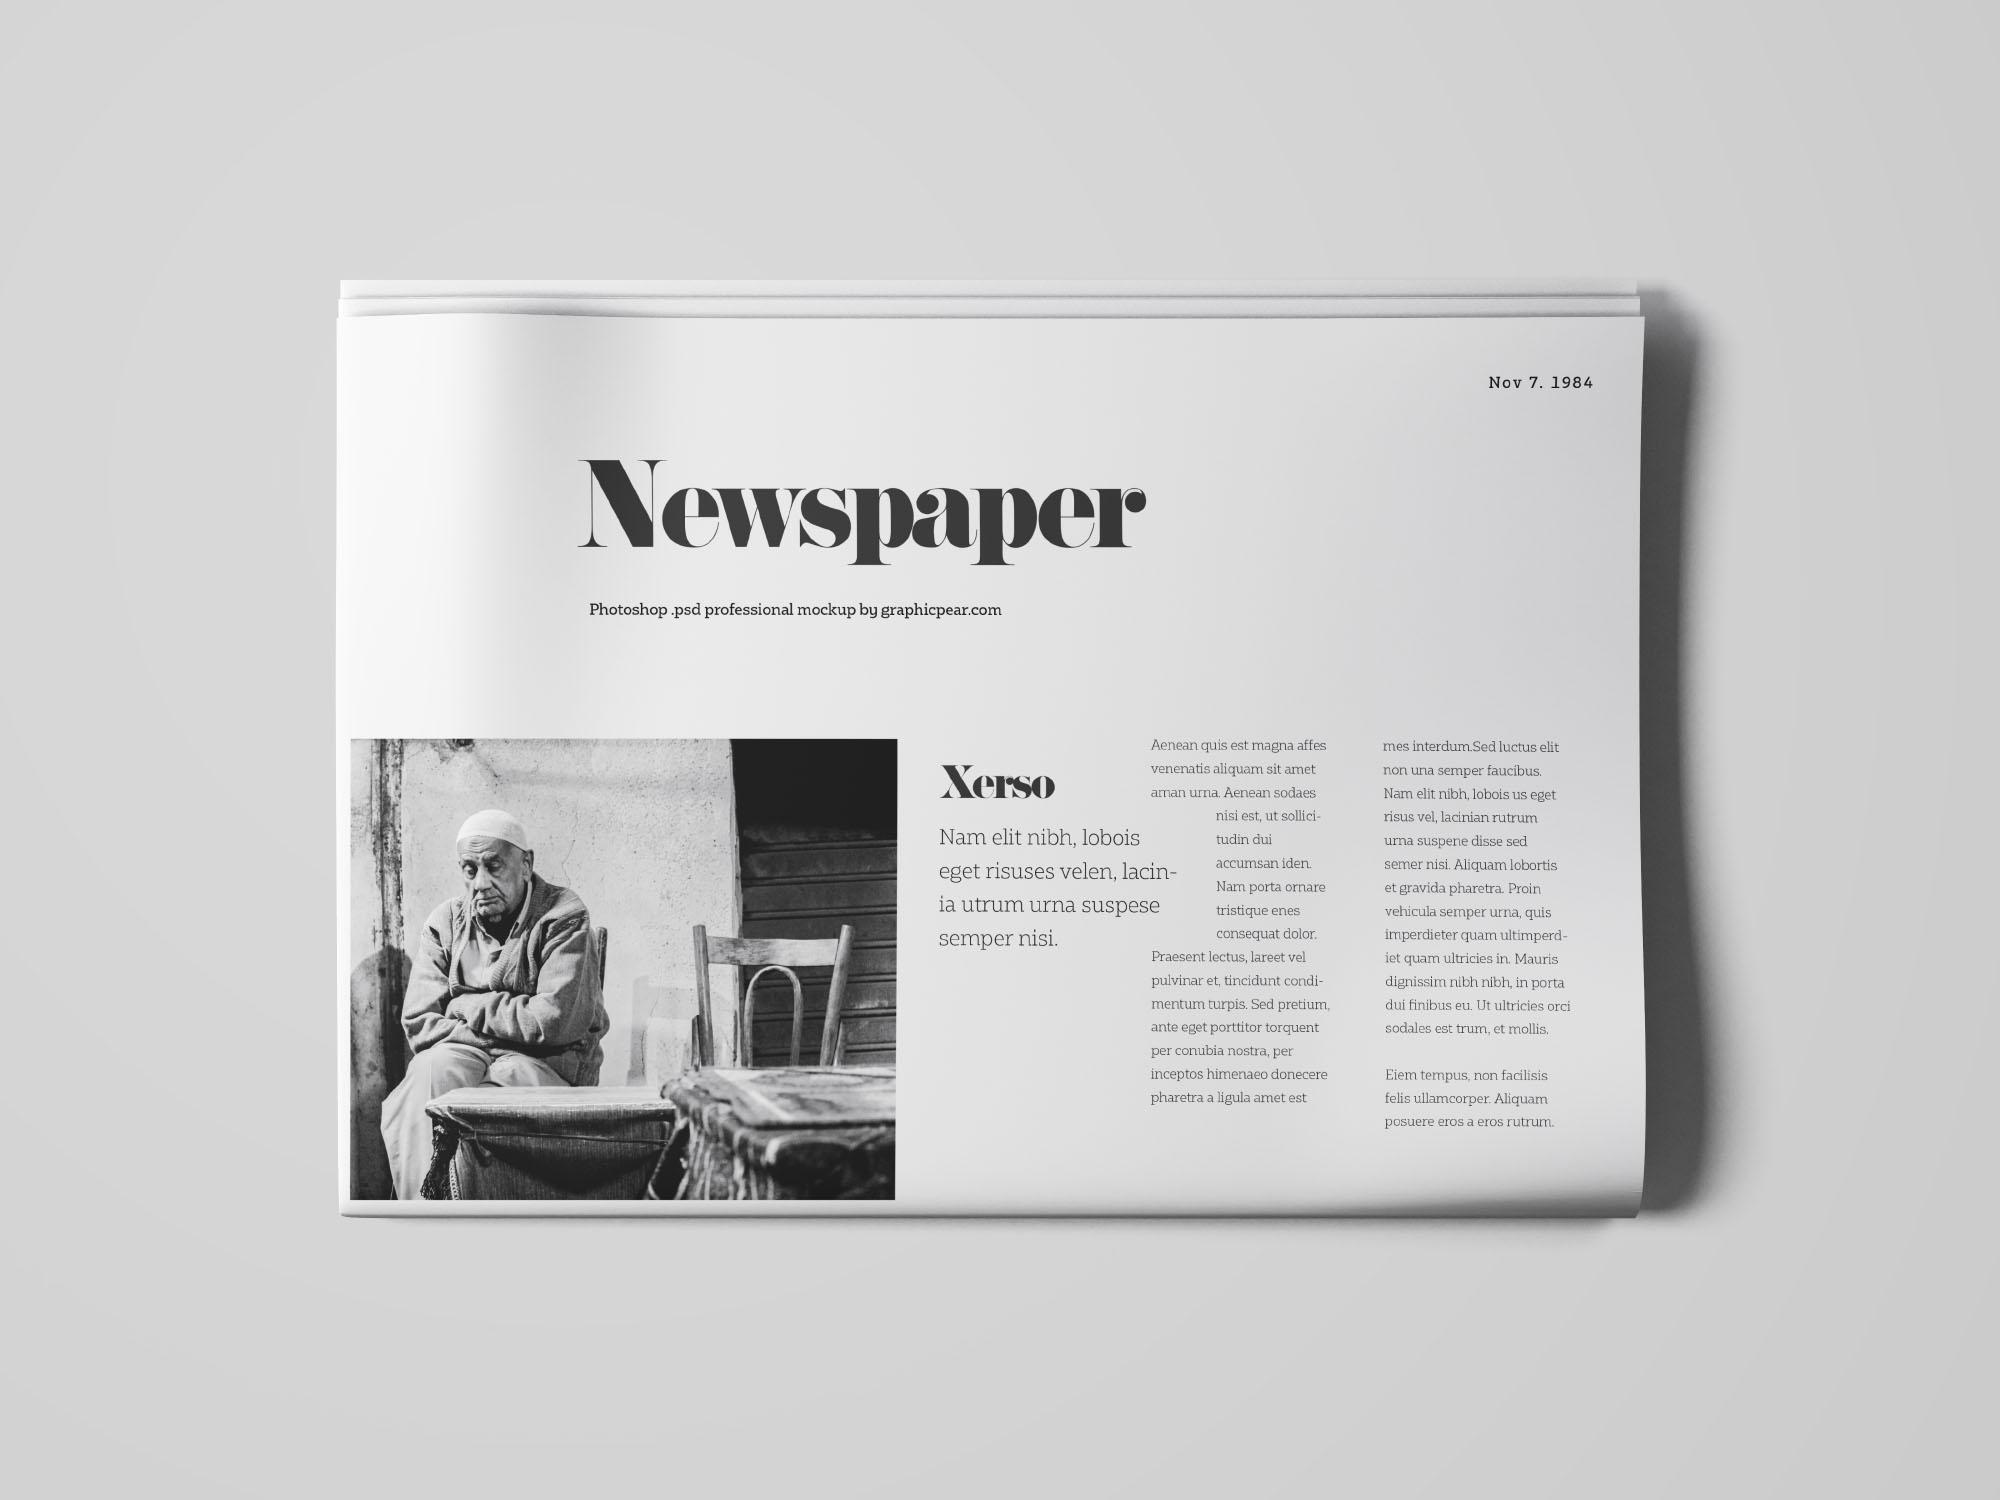 Newspapper Top View Mockup